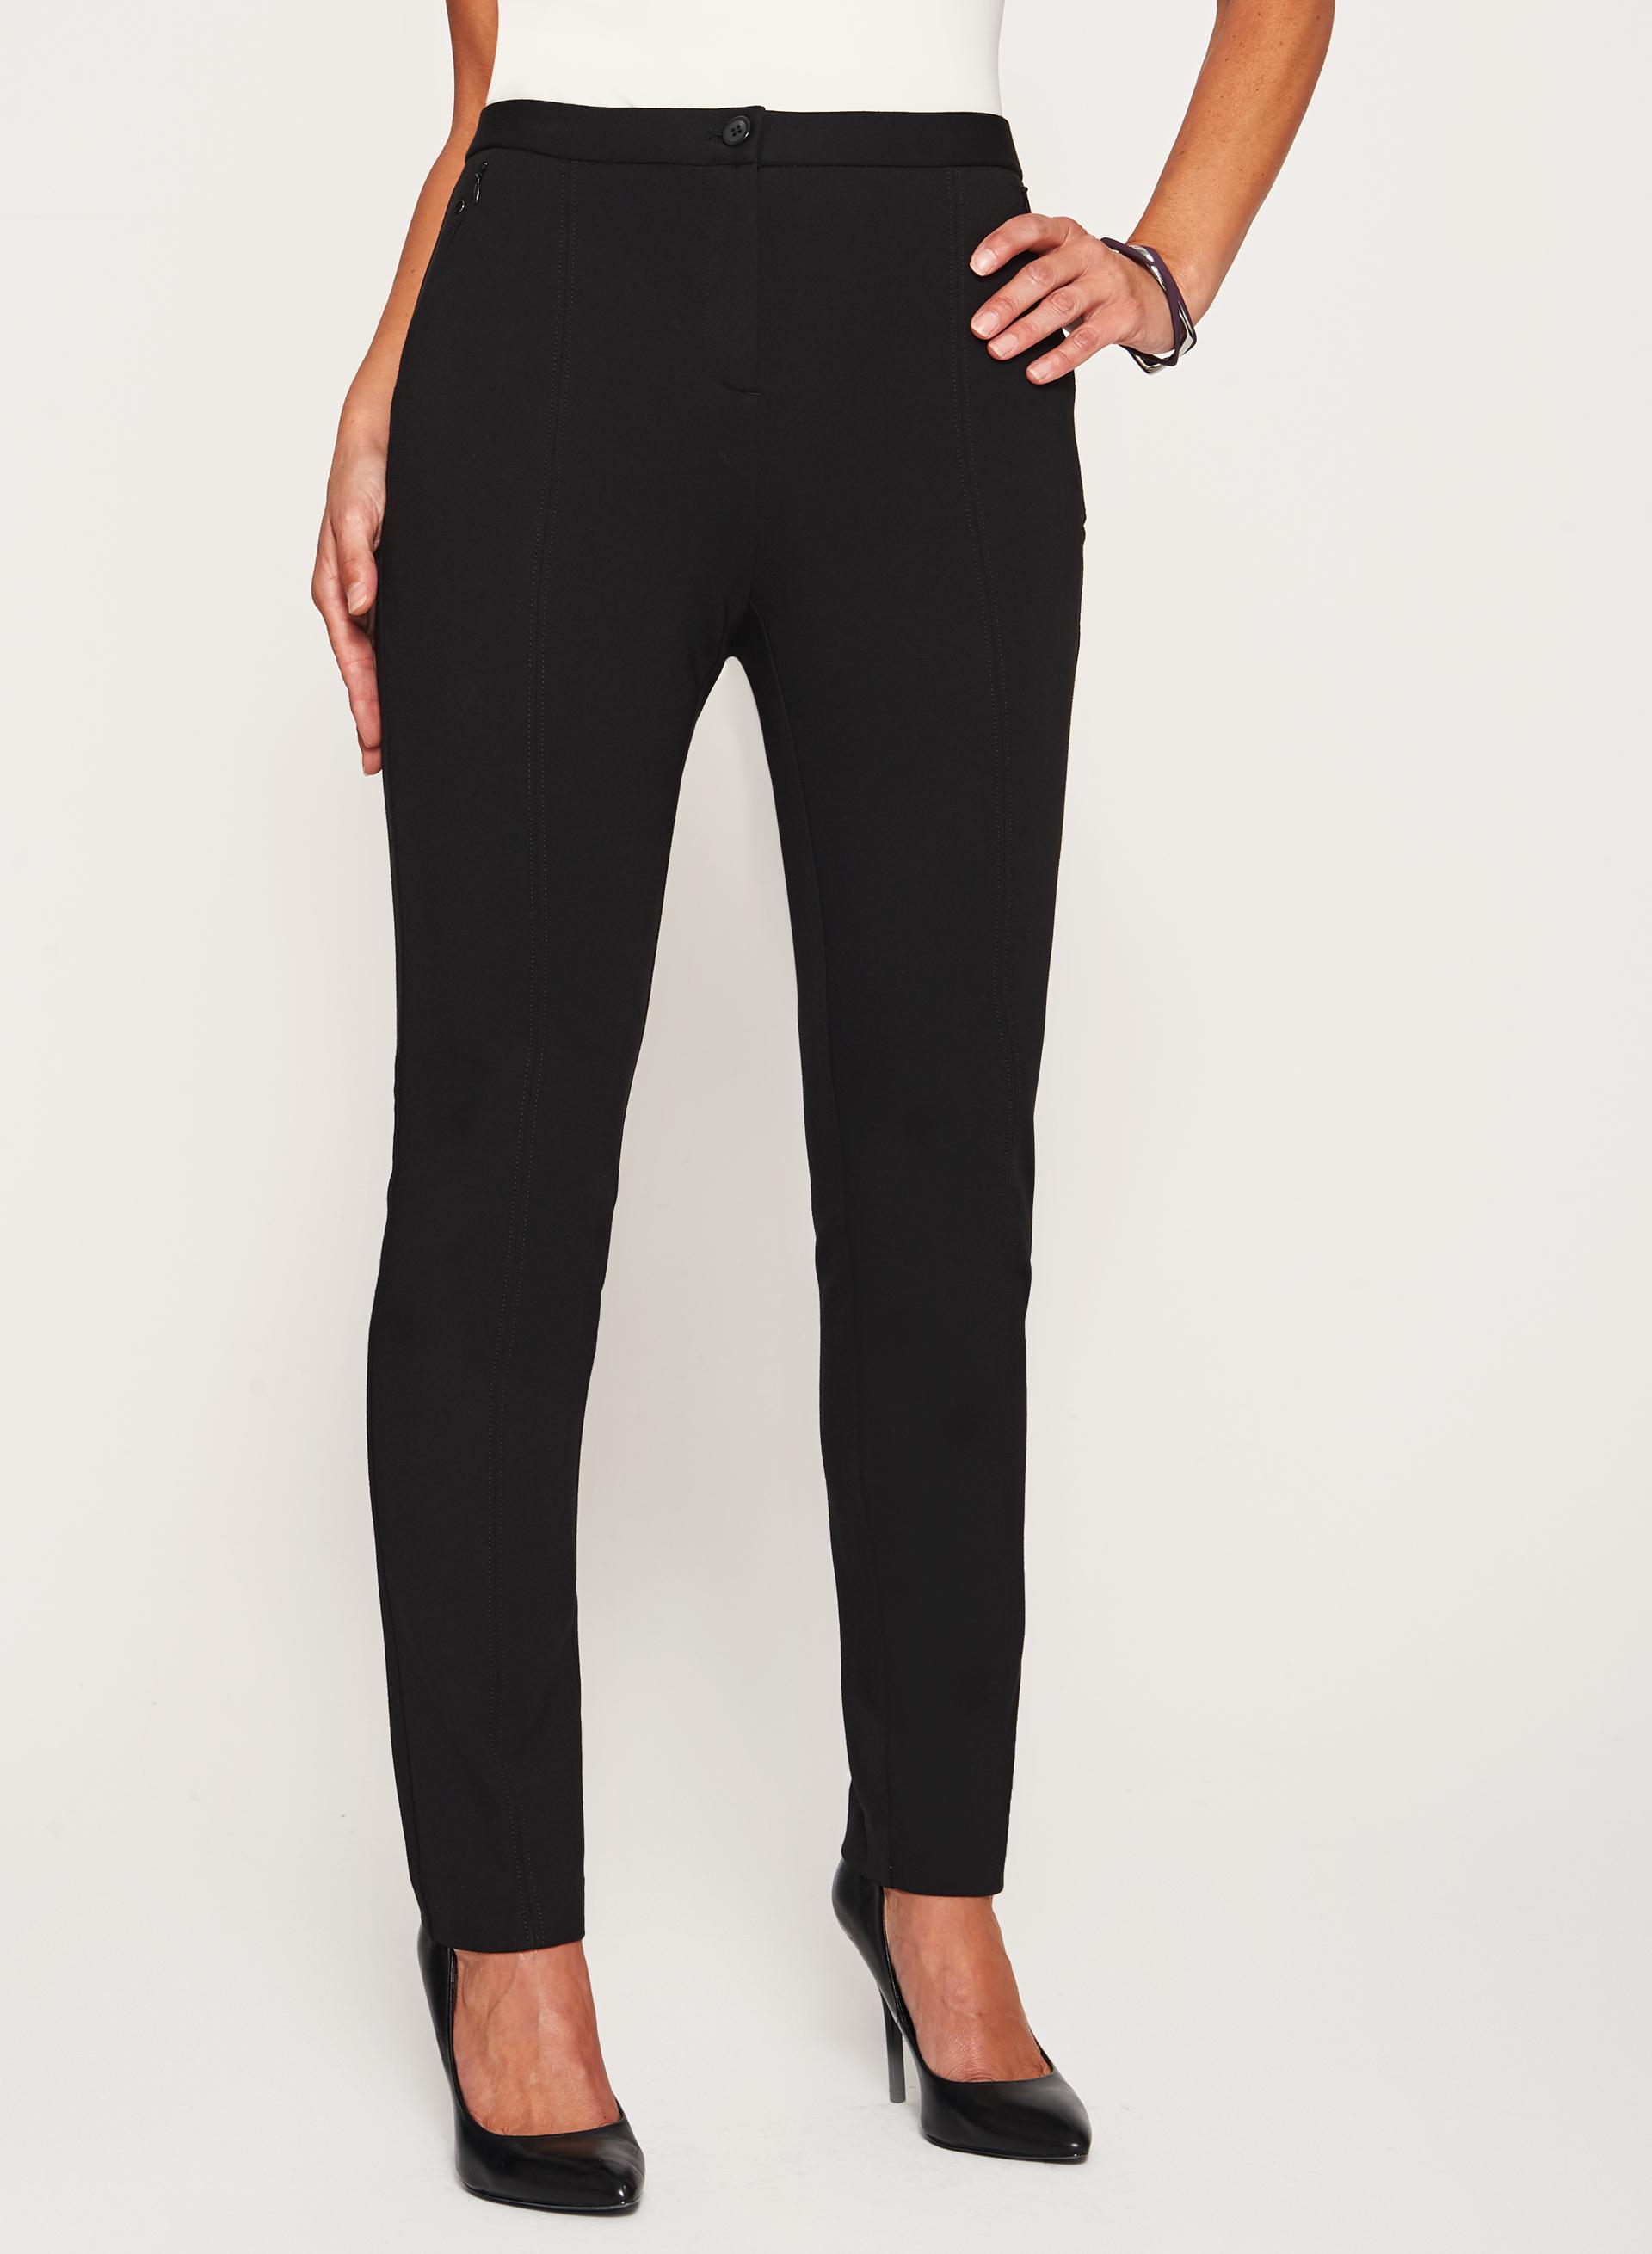 Signature Fit Slim Leg Ponte Pants | Laura